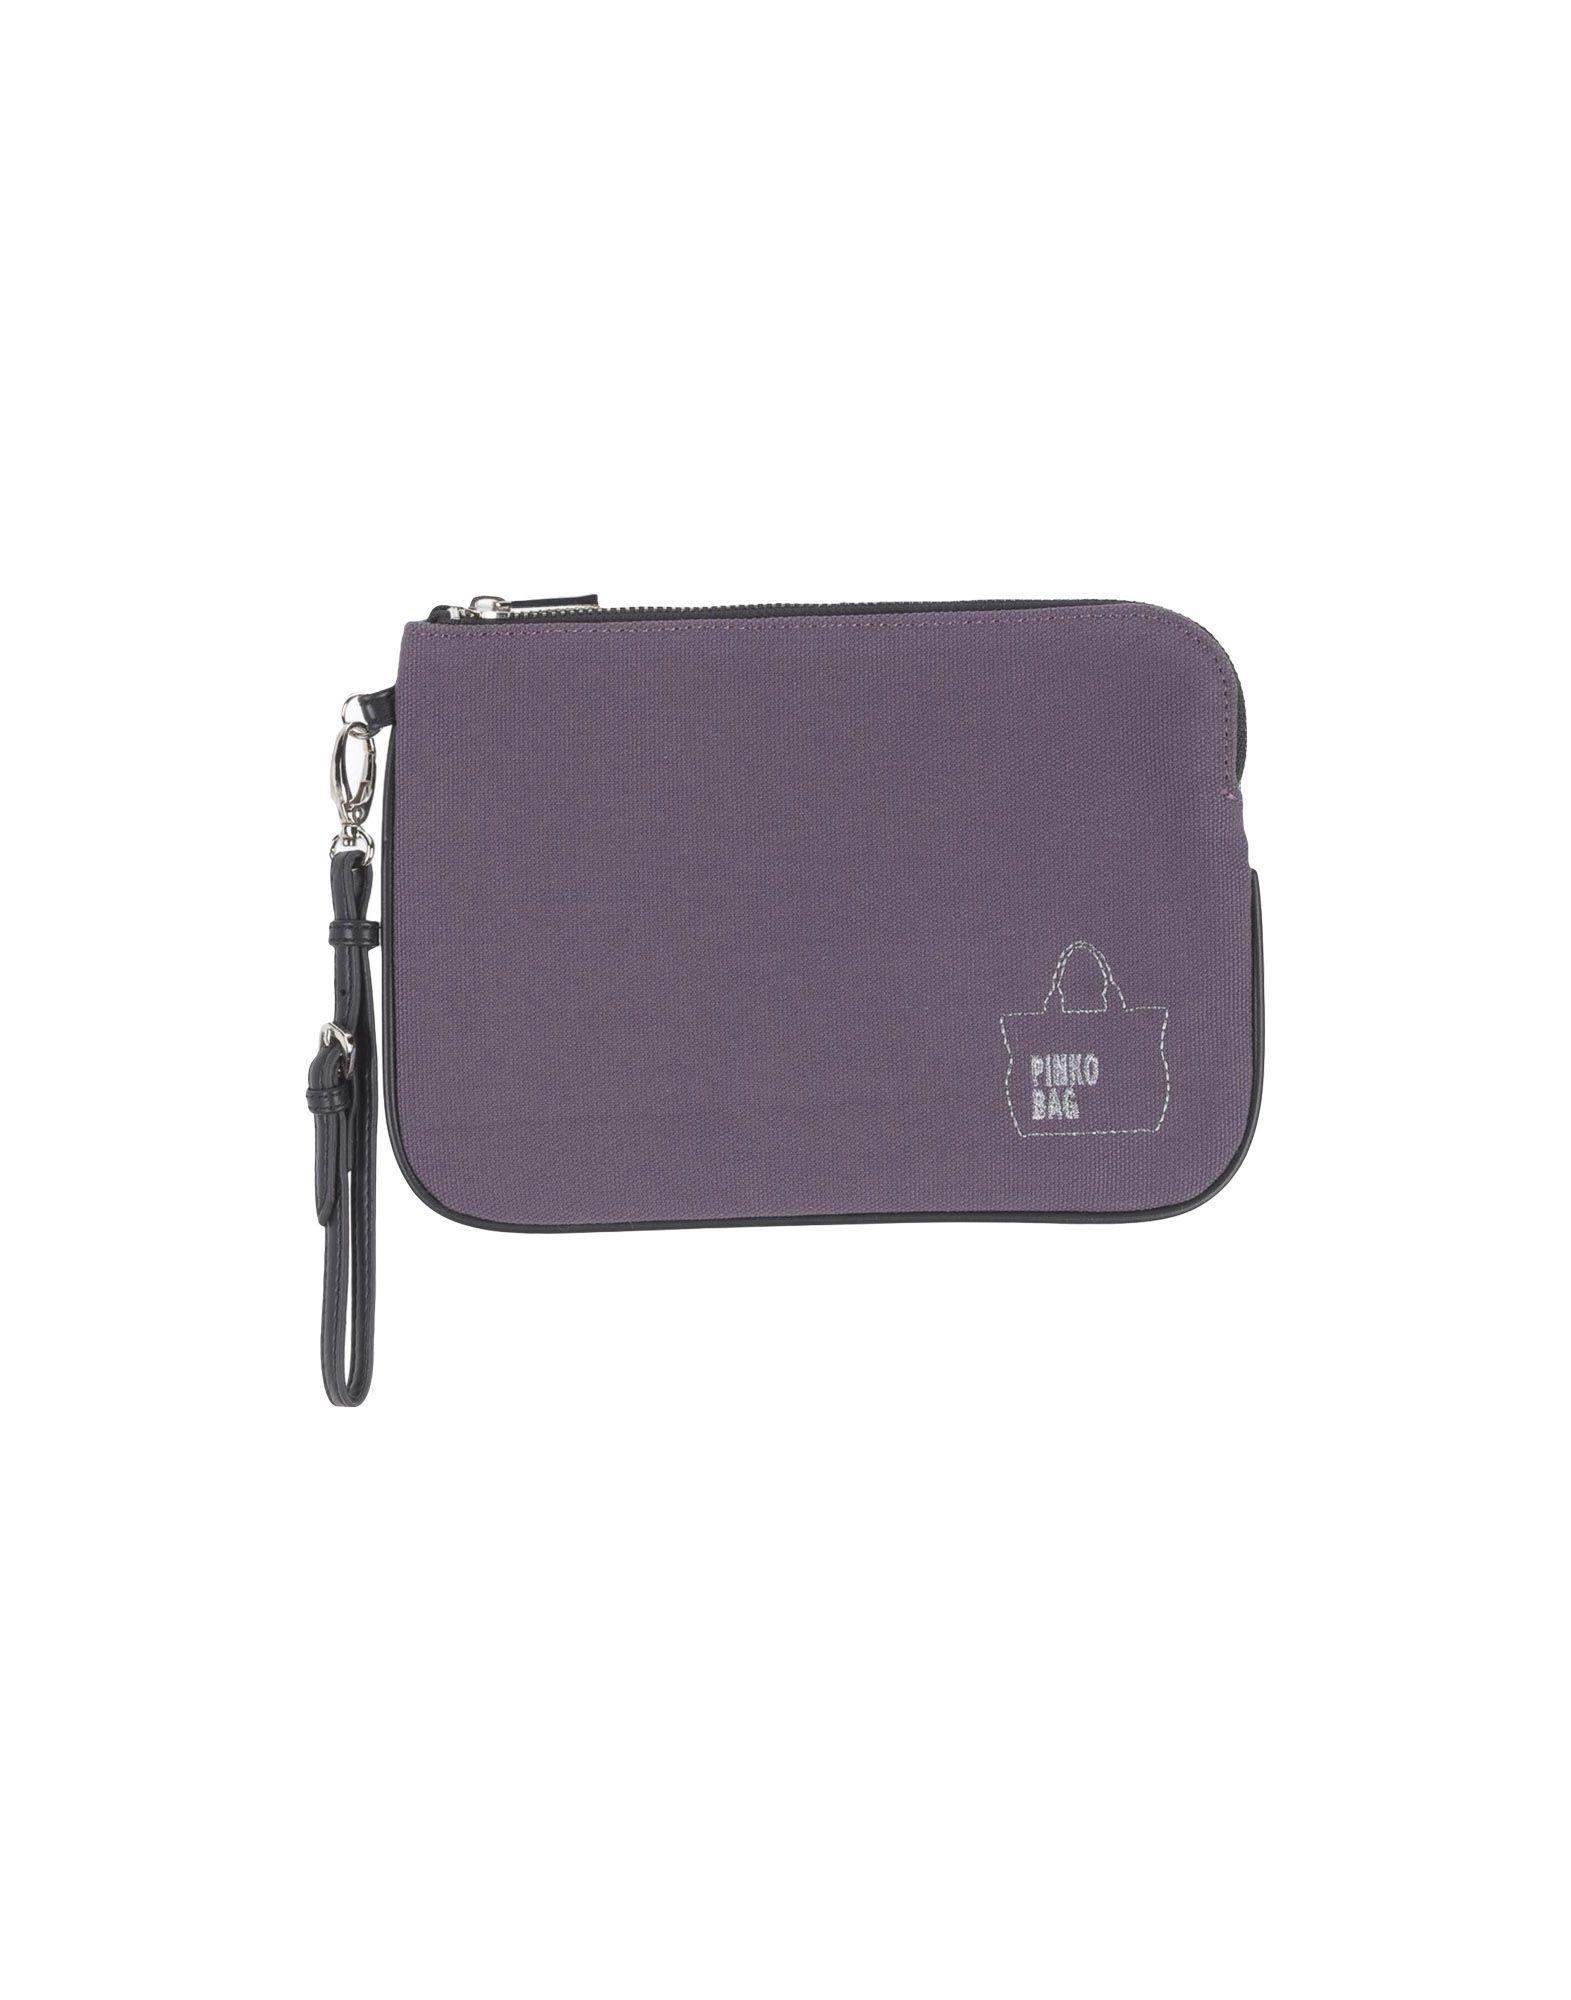 PINKO BAG Косметичка косметичка women bag attro yo sh470 ls5745 women bags cosmetic bag cases makeup bag travel bags bolsas